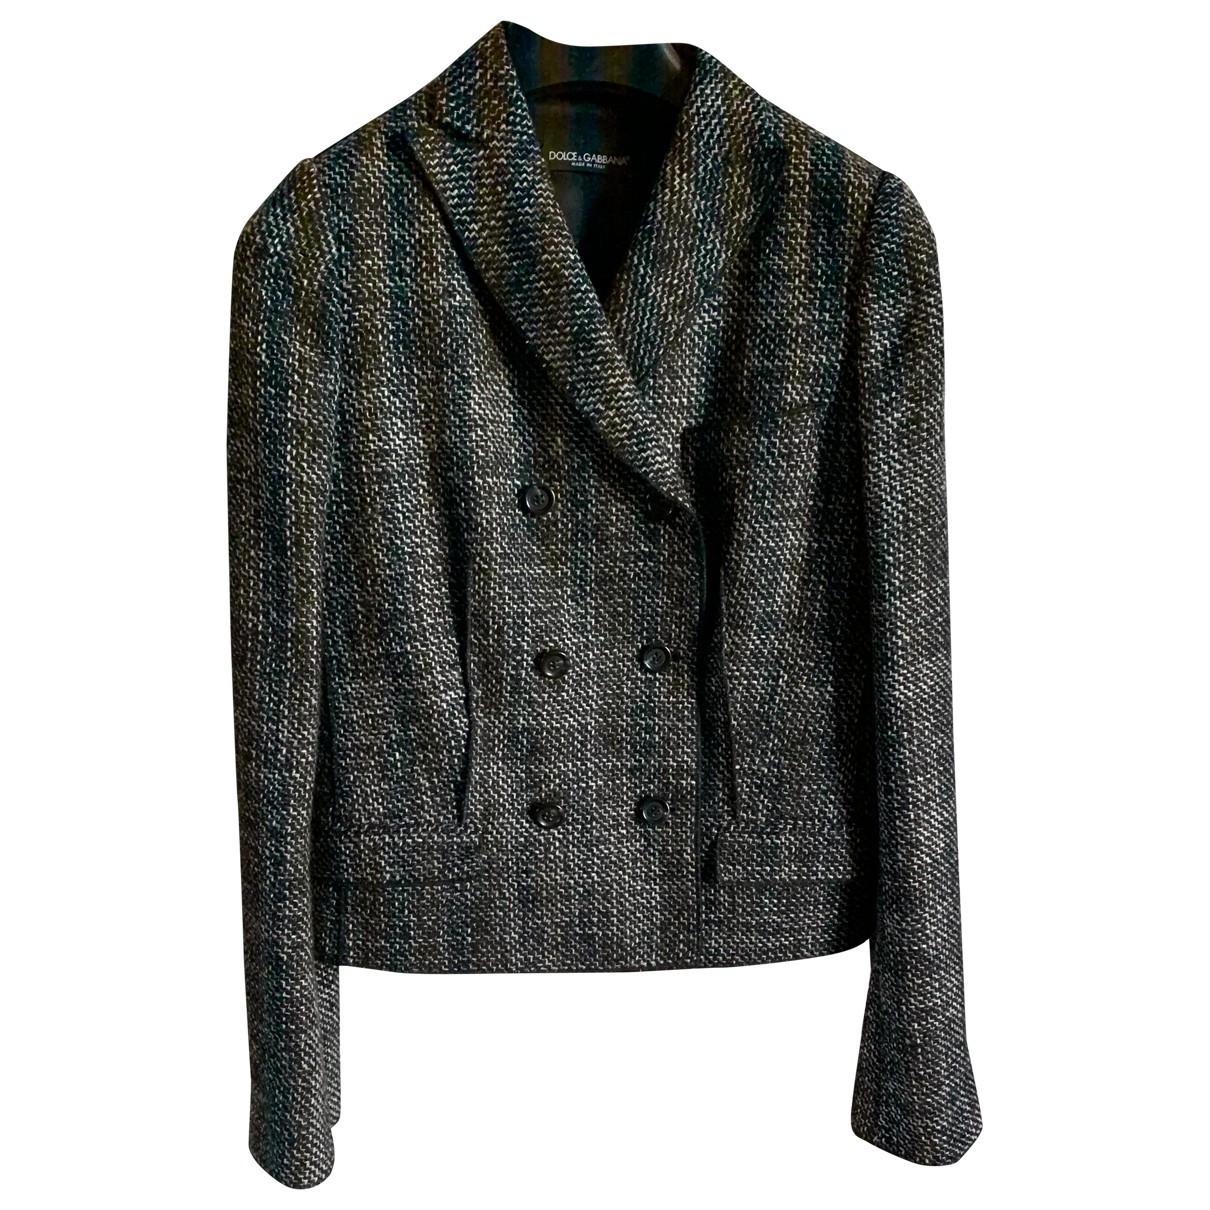 Dolce & Gabbana \N Jacke in  Anthrazit Wolle